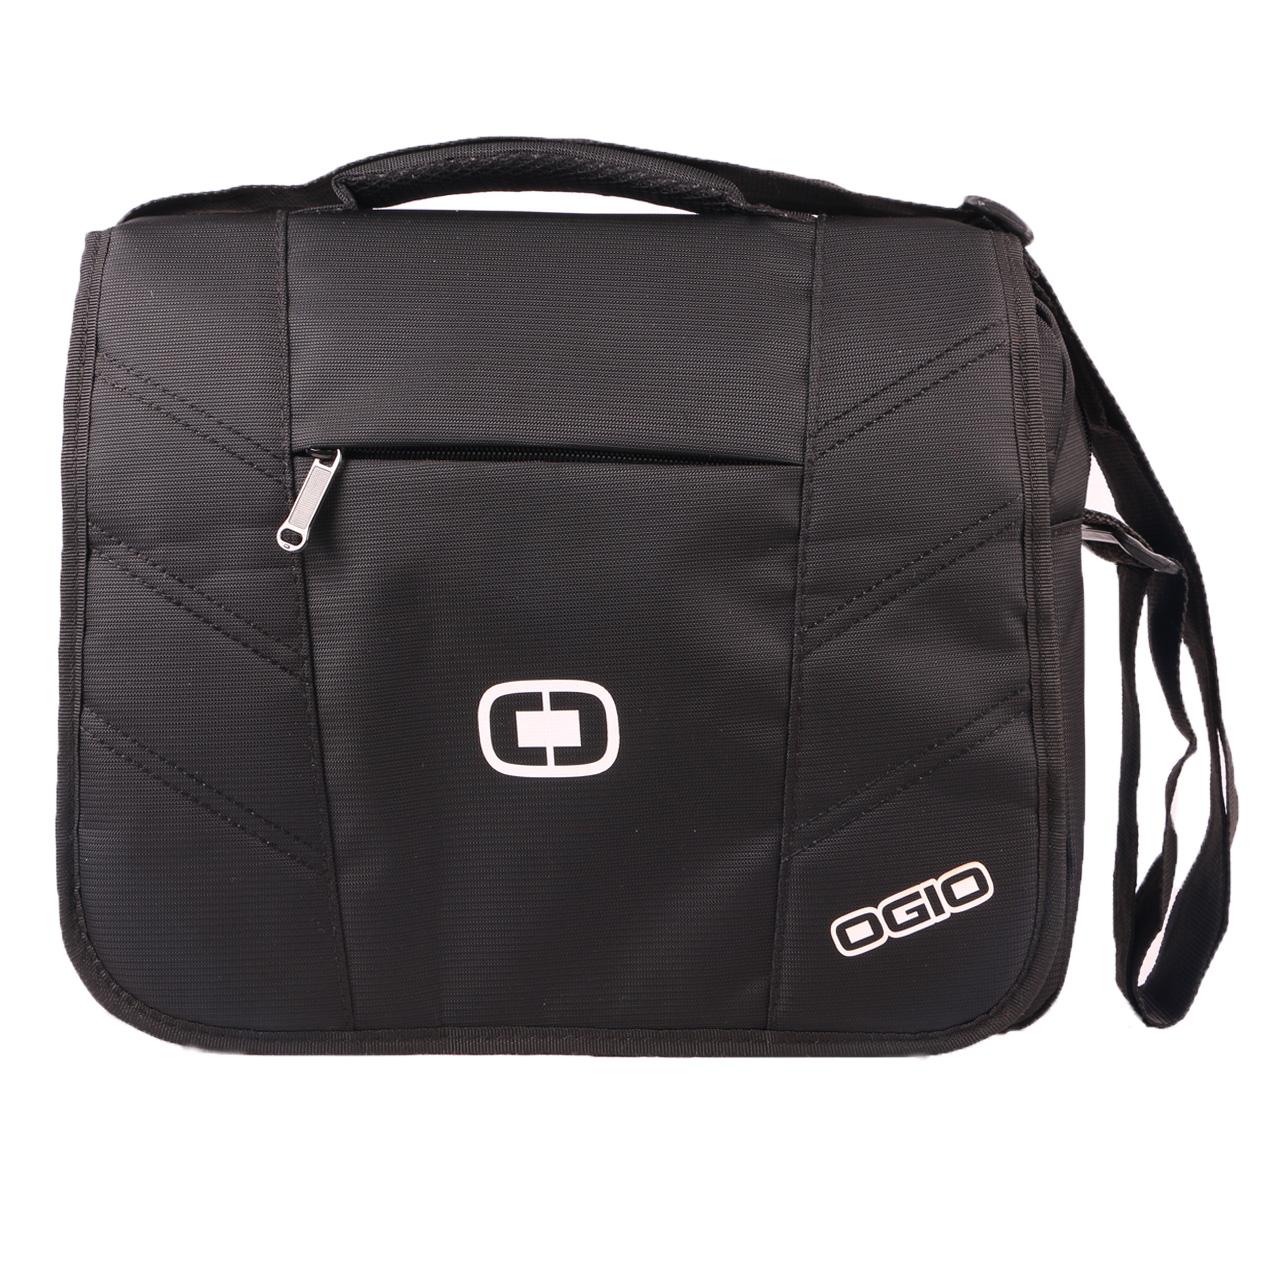 کیف دوشی مدل oG-O